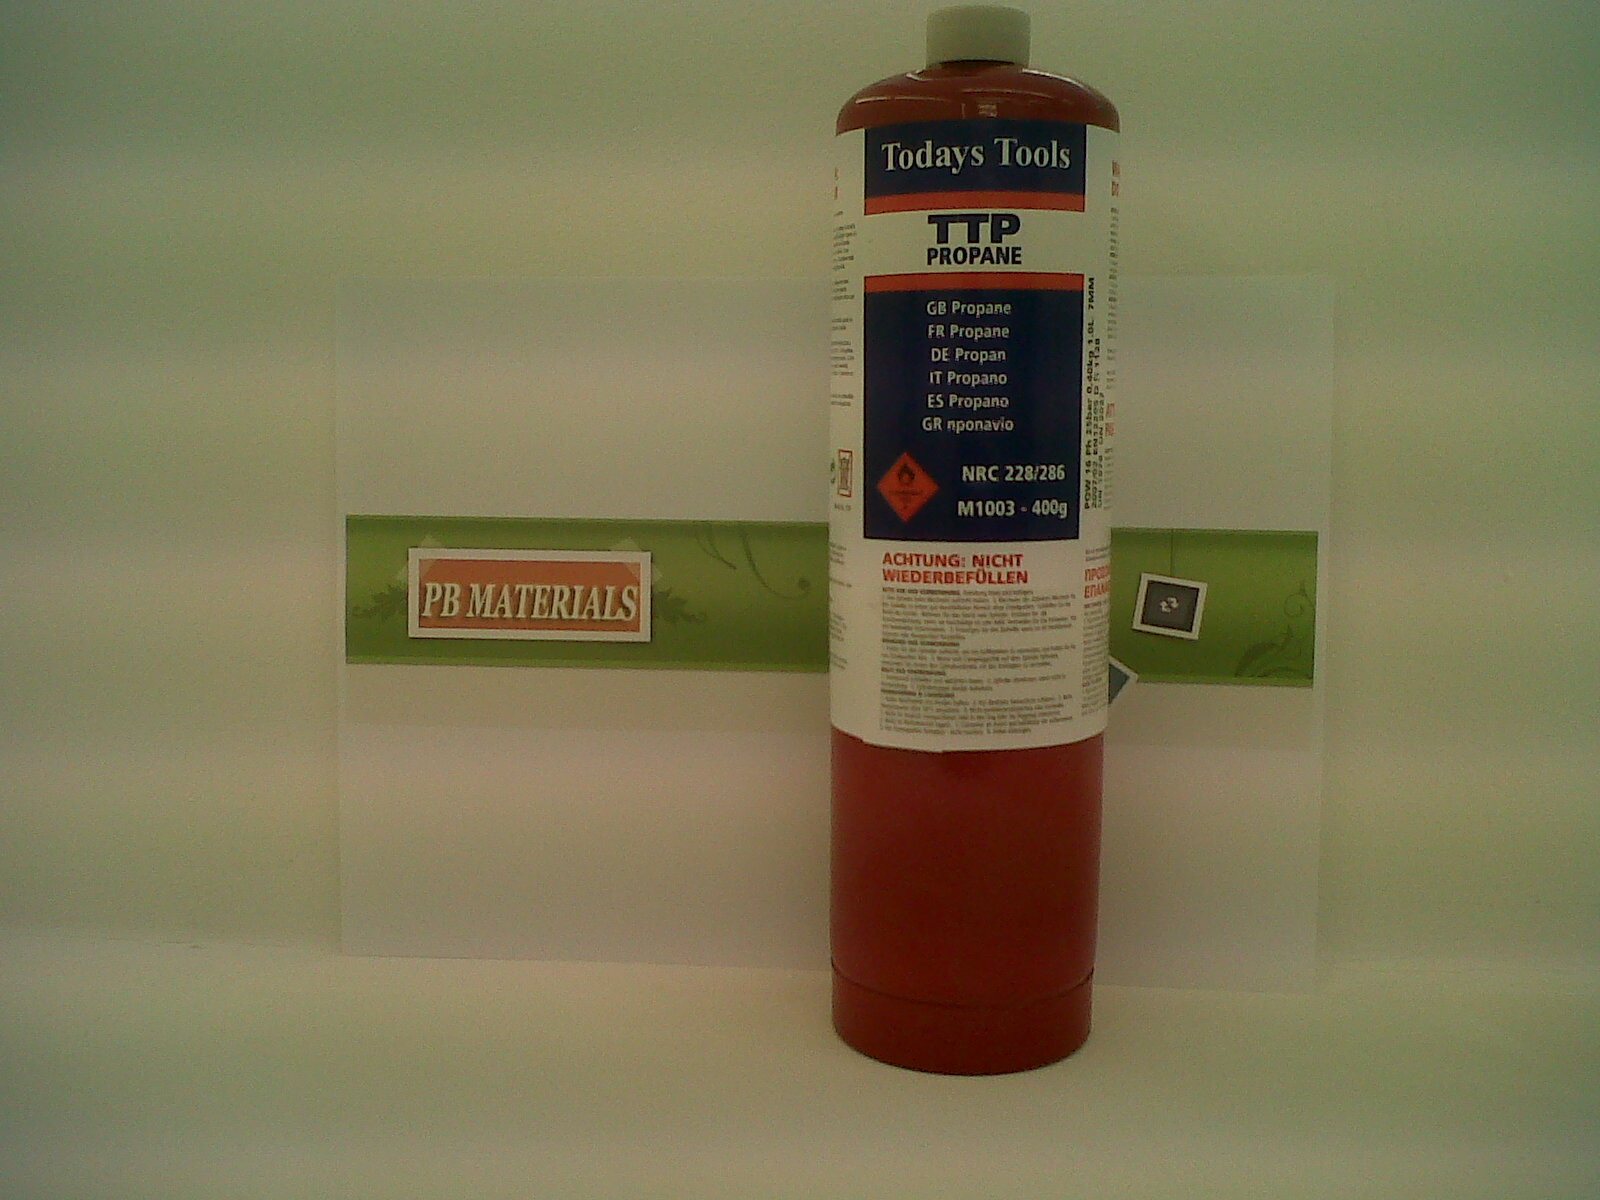 Pb Materials Ttp Red Propane Gas Cylinder 400g